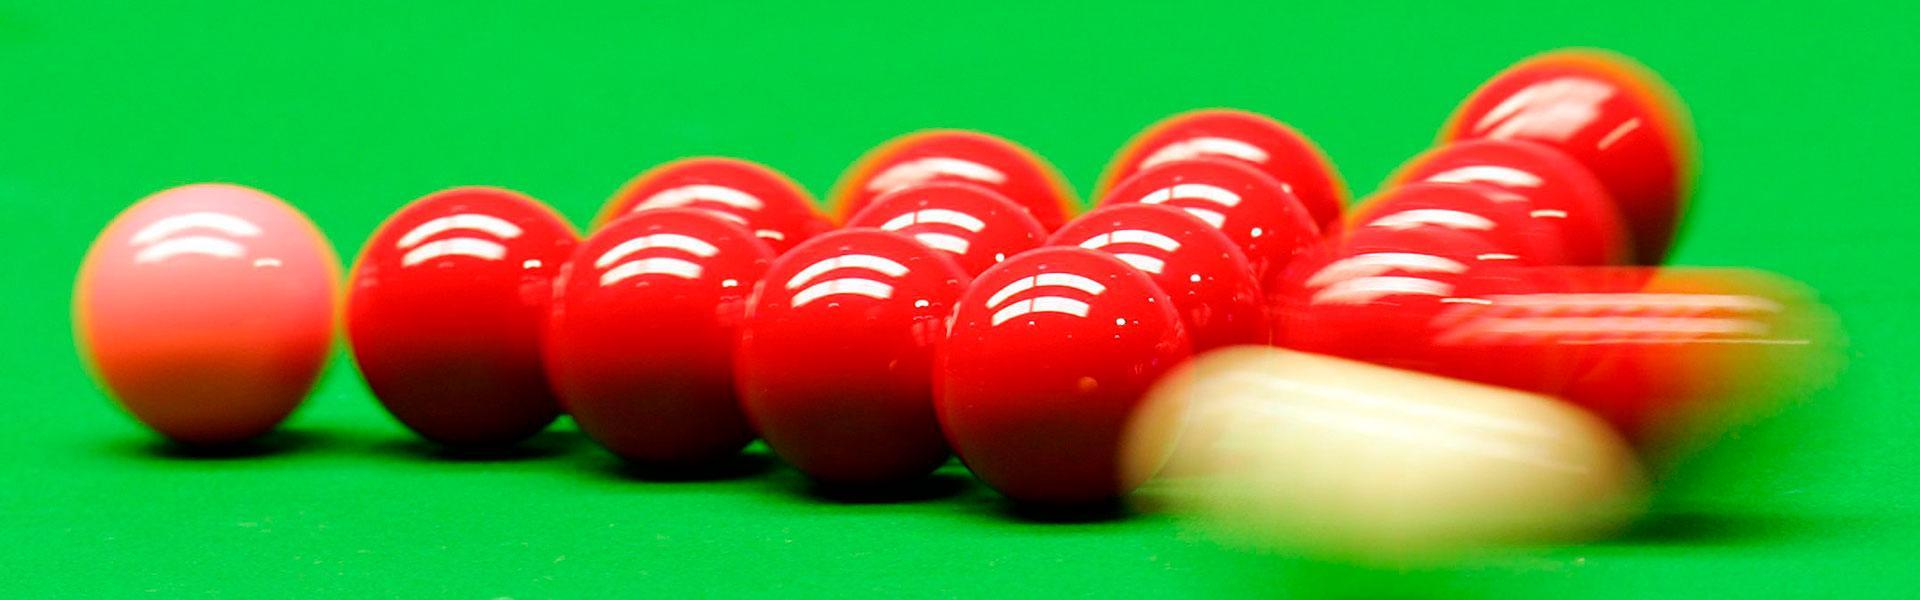 snooker-4